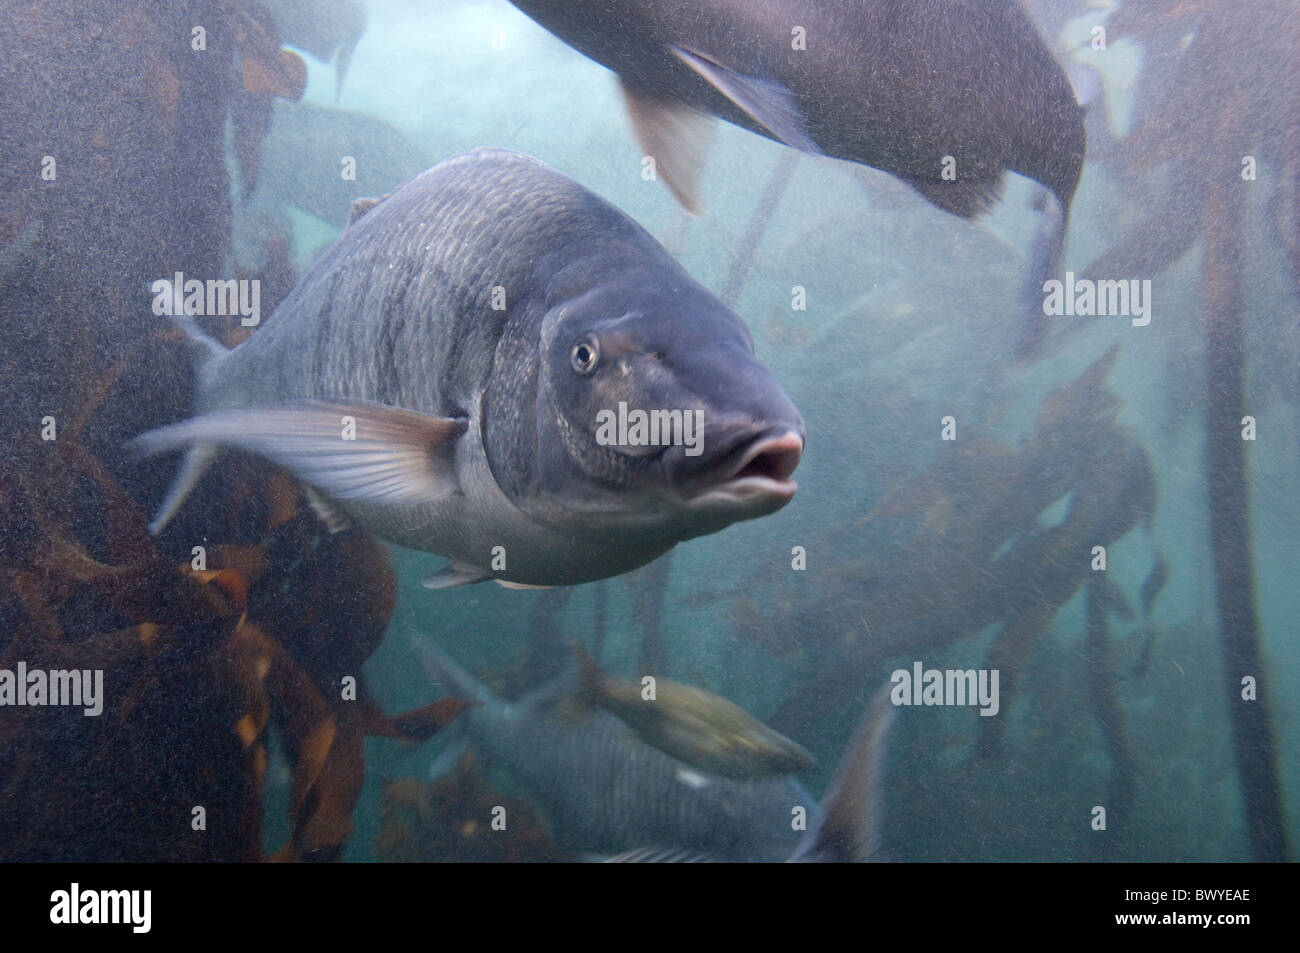 Freshwater aquarium fish cape town - South Africa Cape Town Two Oceans Aquarium White Steenbass In Fish Tank